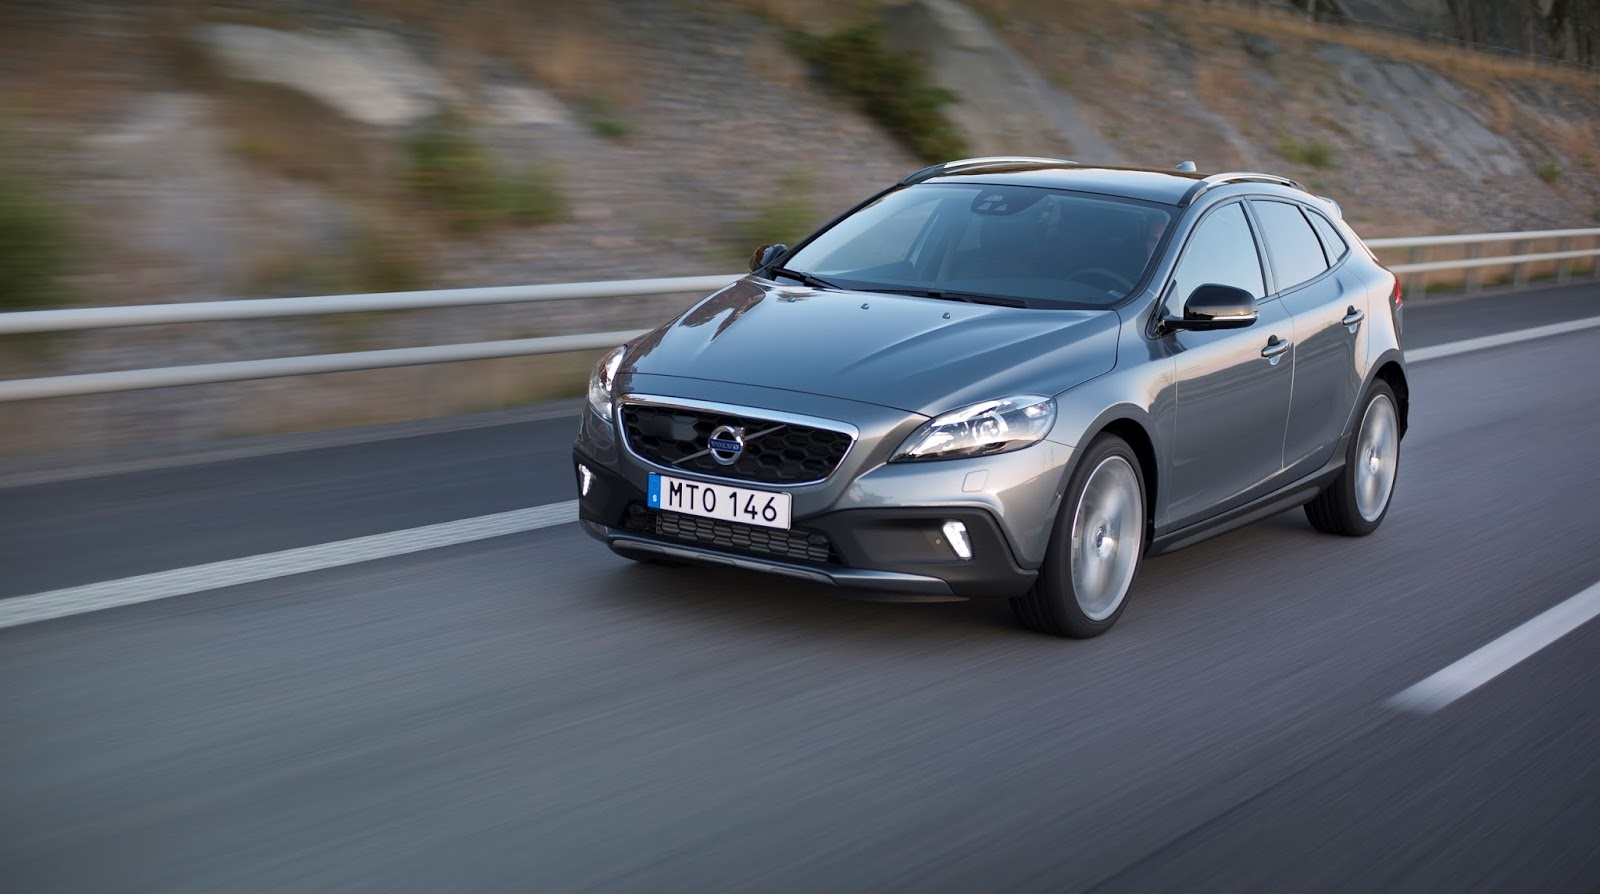 V40%2BCROSS%2BCOUNTRY%2B1.5%2BT3%2BAUTO 1 Το Volvo V40 Cross Country με το νέο κινητήρα 1,5 λίτρων, απόδοσης 152 ίππων από 21.900 €